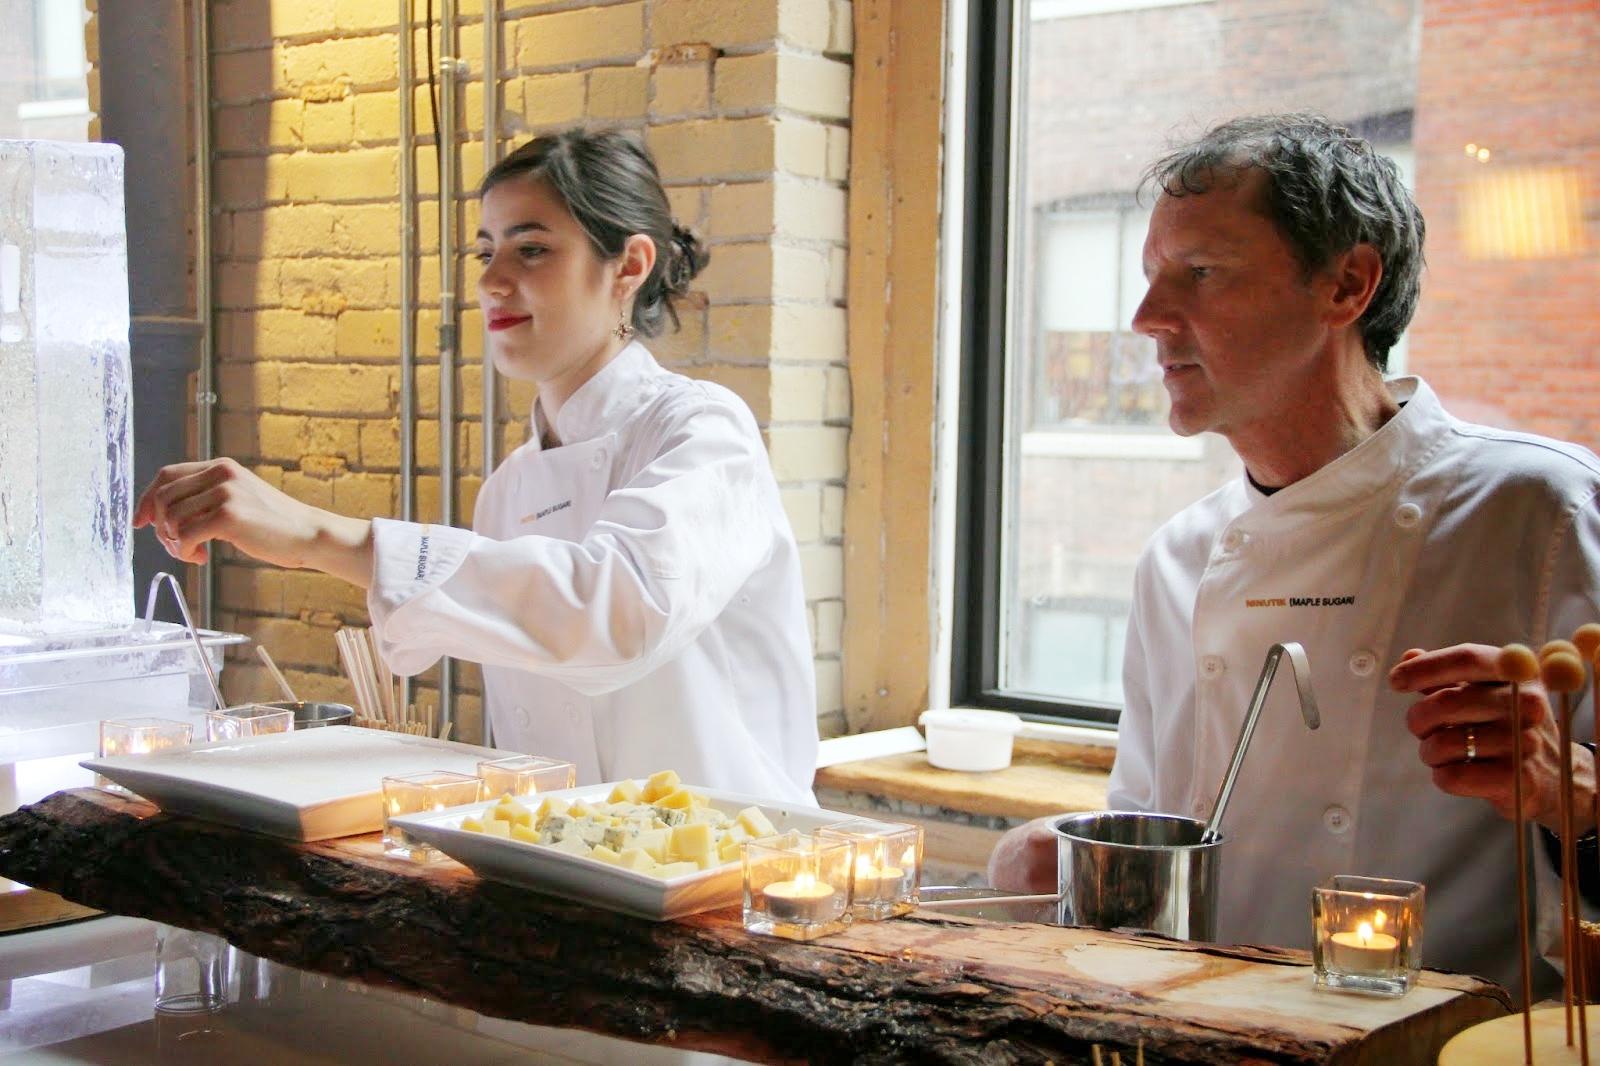 Mimi and Ric, Taste of Toronto, 2014